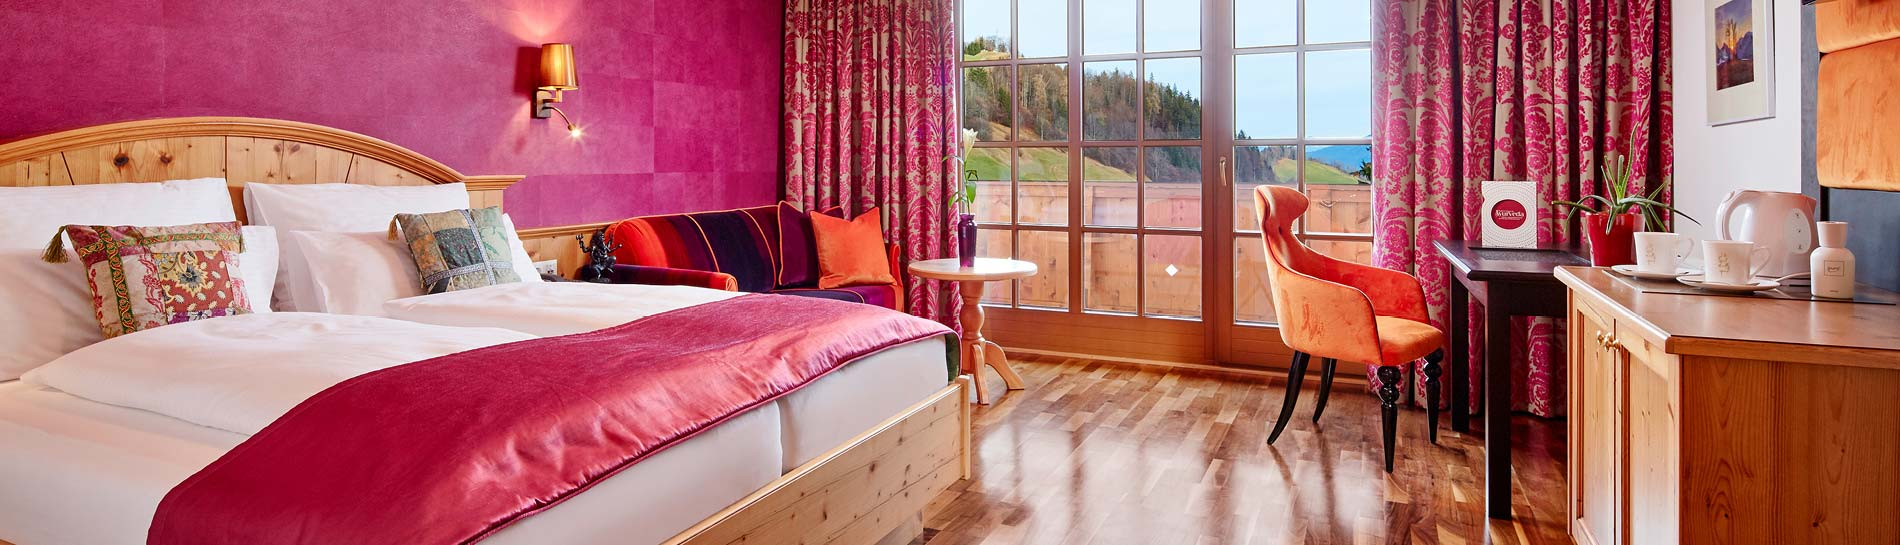 European Ayurveda Resort Sonnhof Tyrol Austria